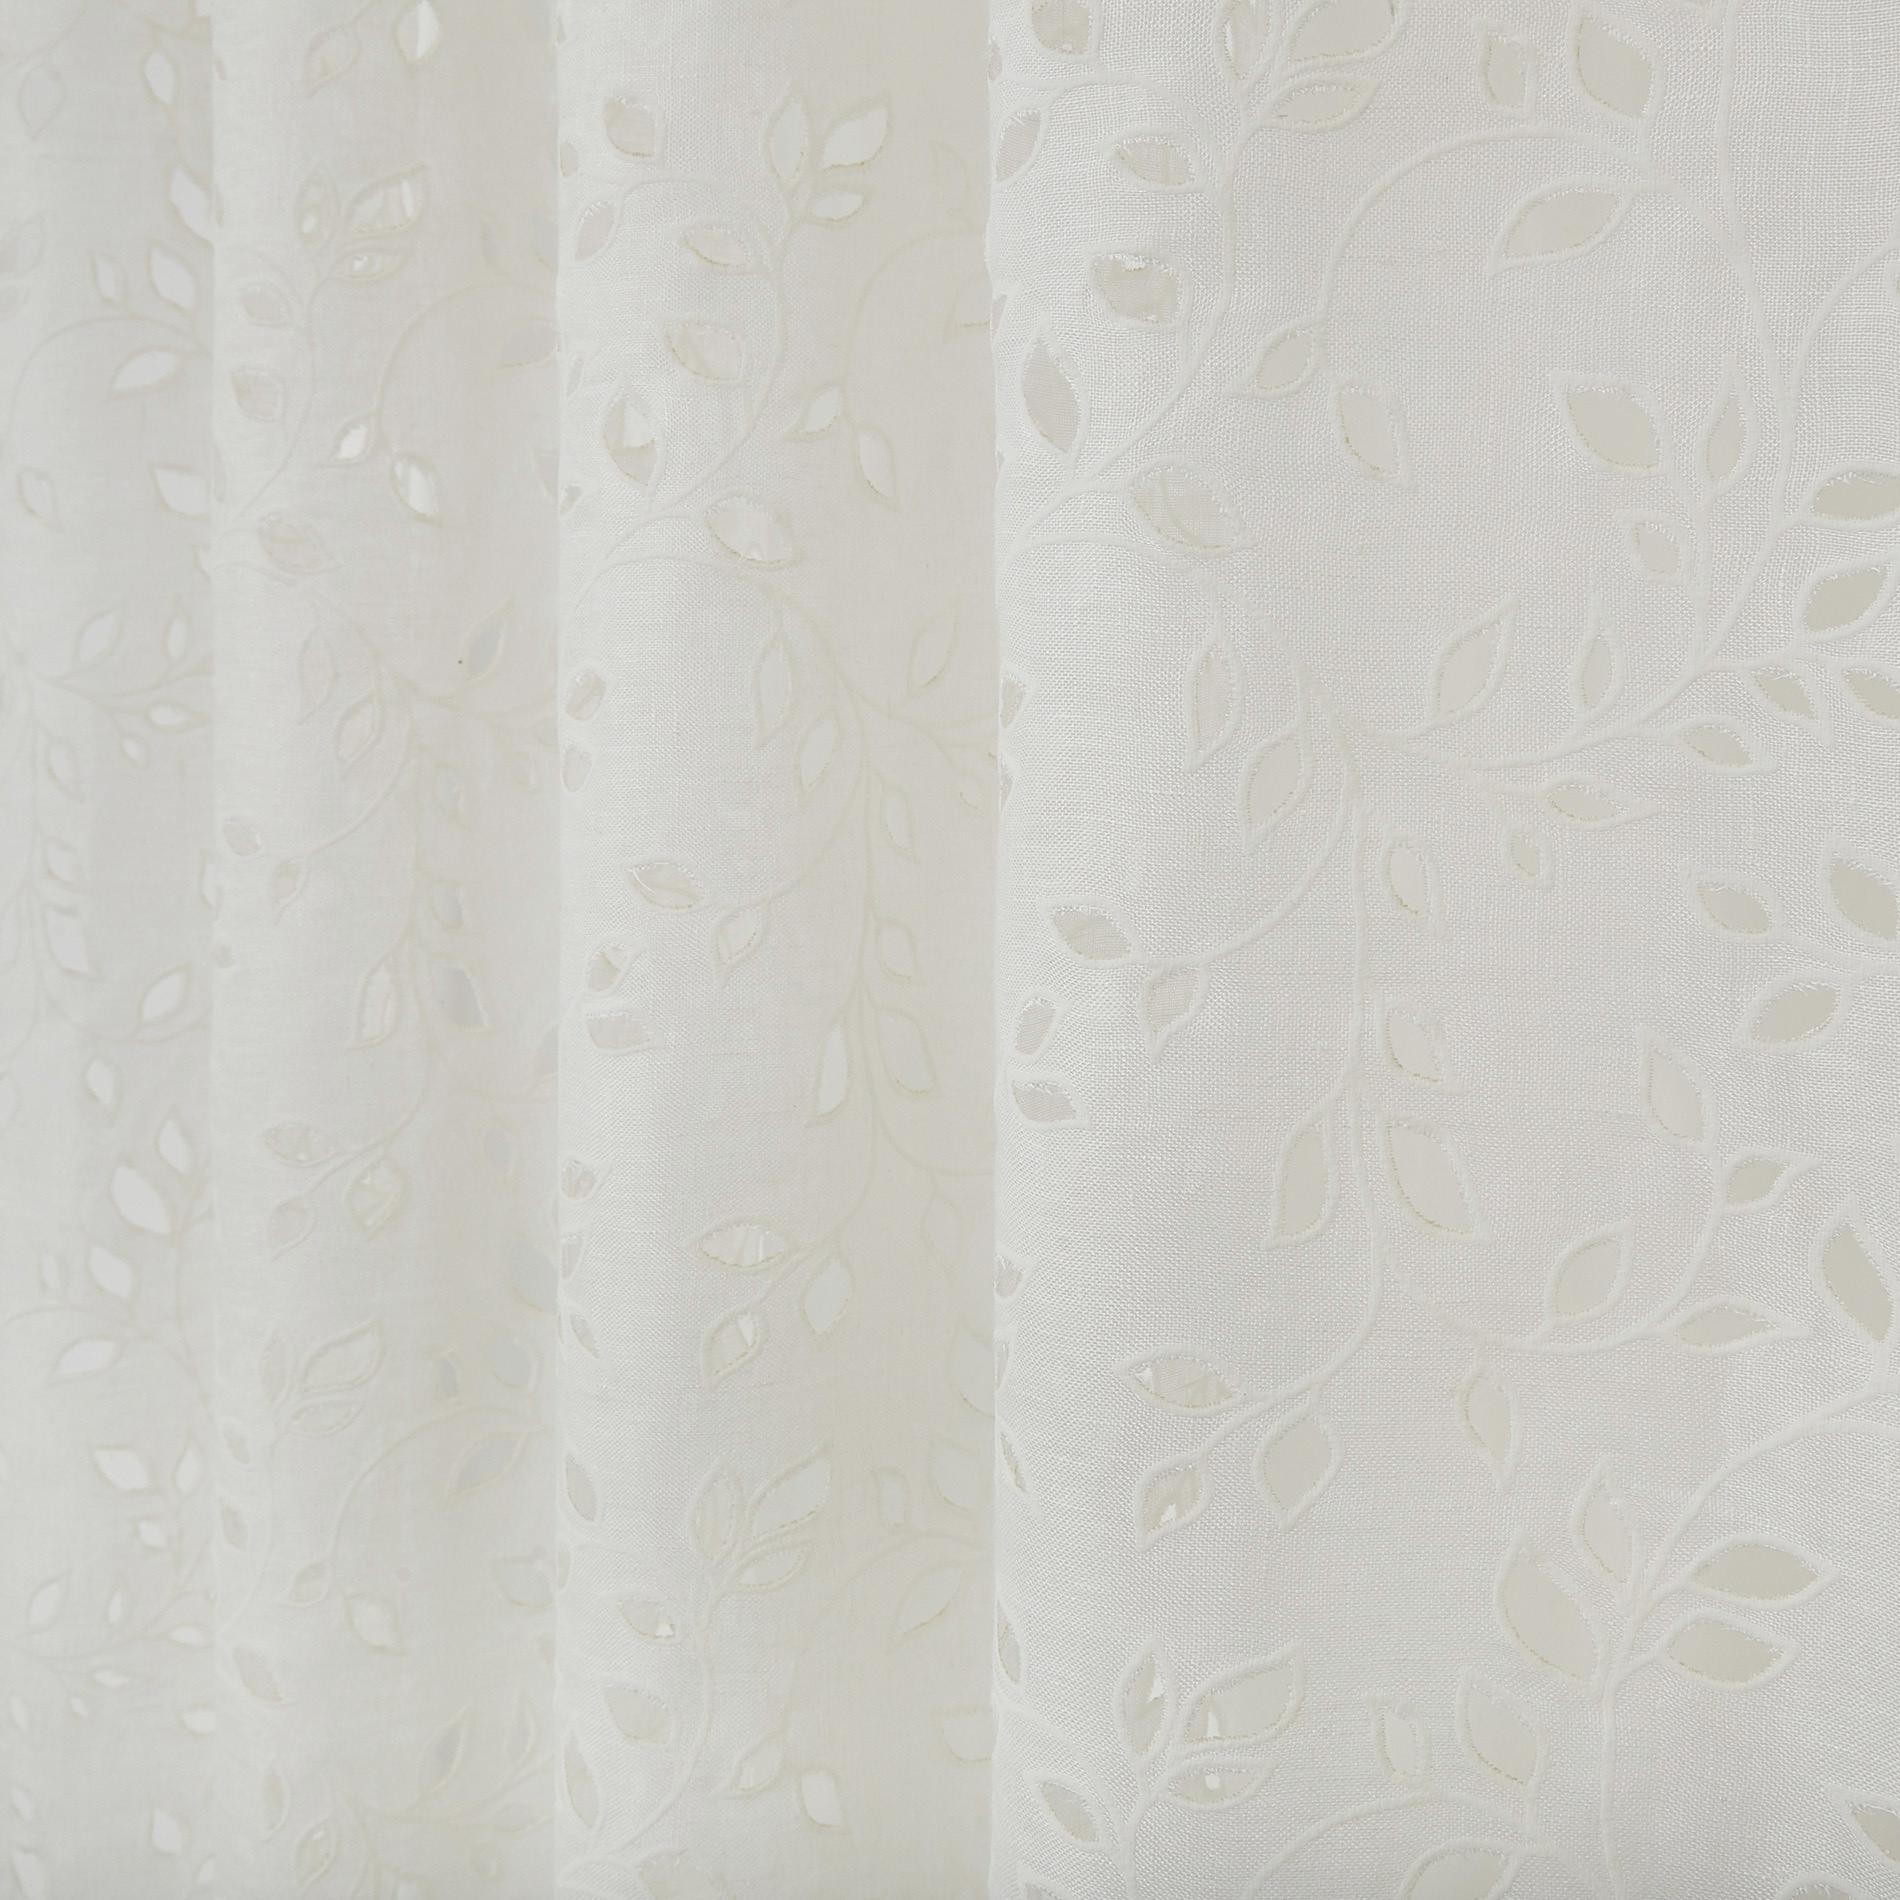 Tenda lino sangallo passanti nascosti, Bianco, large image number 0